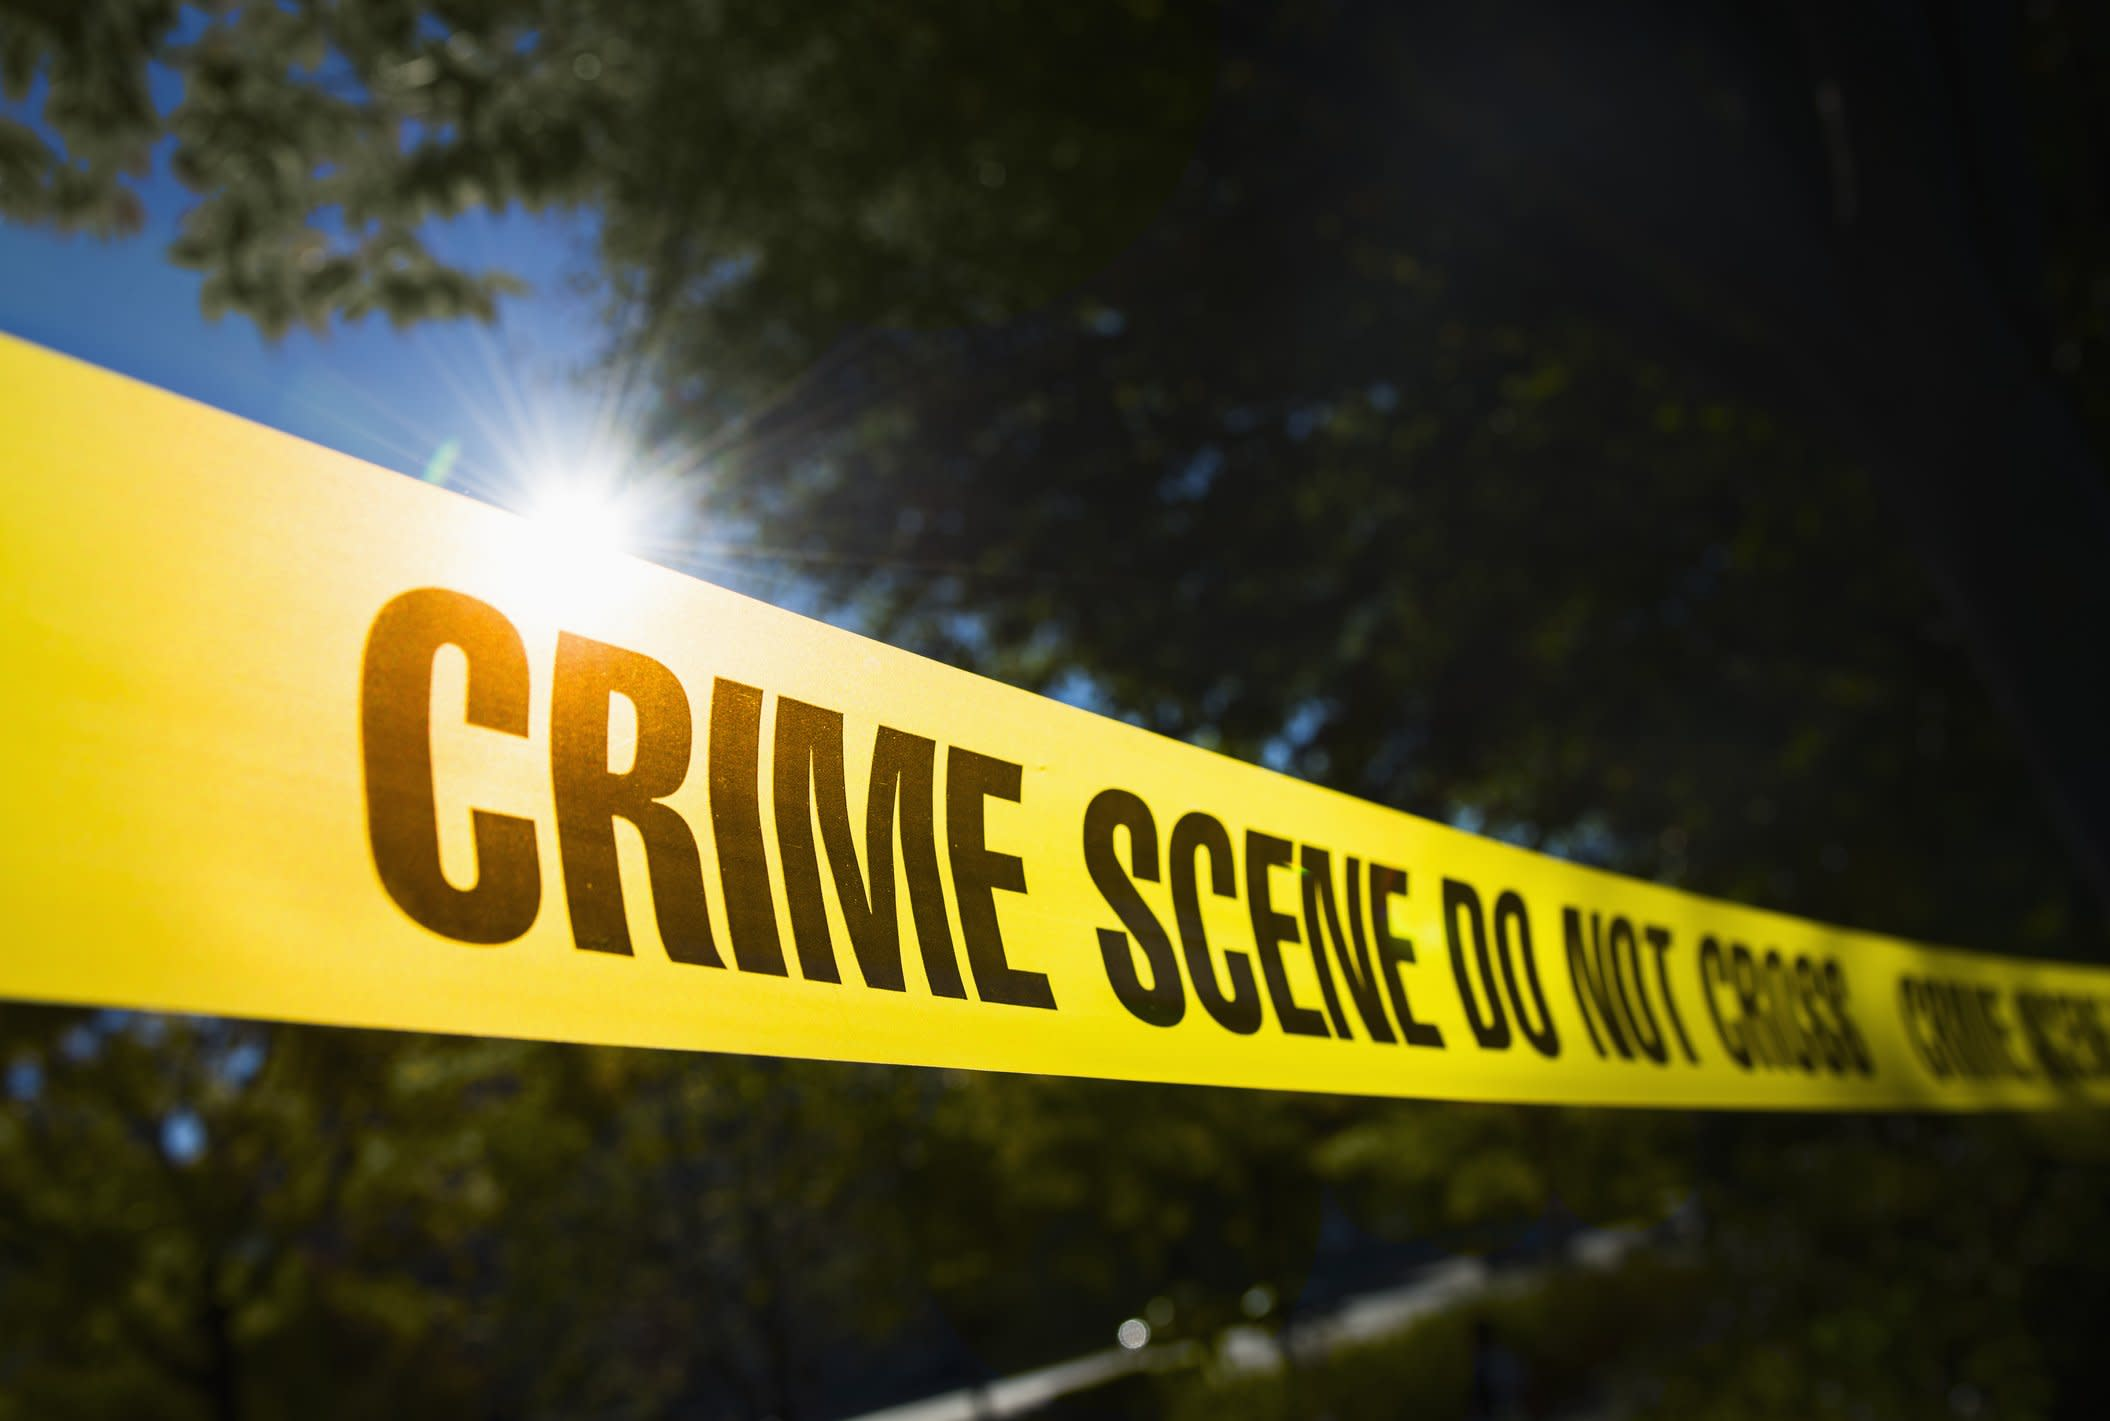 Man Opens Fire in Georgia Walmart Dies After Turning Gun on Himself: Police